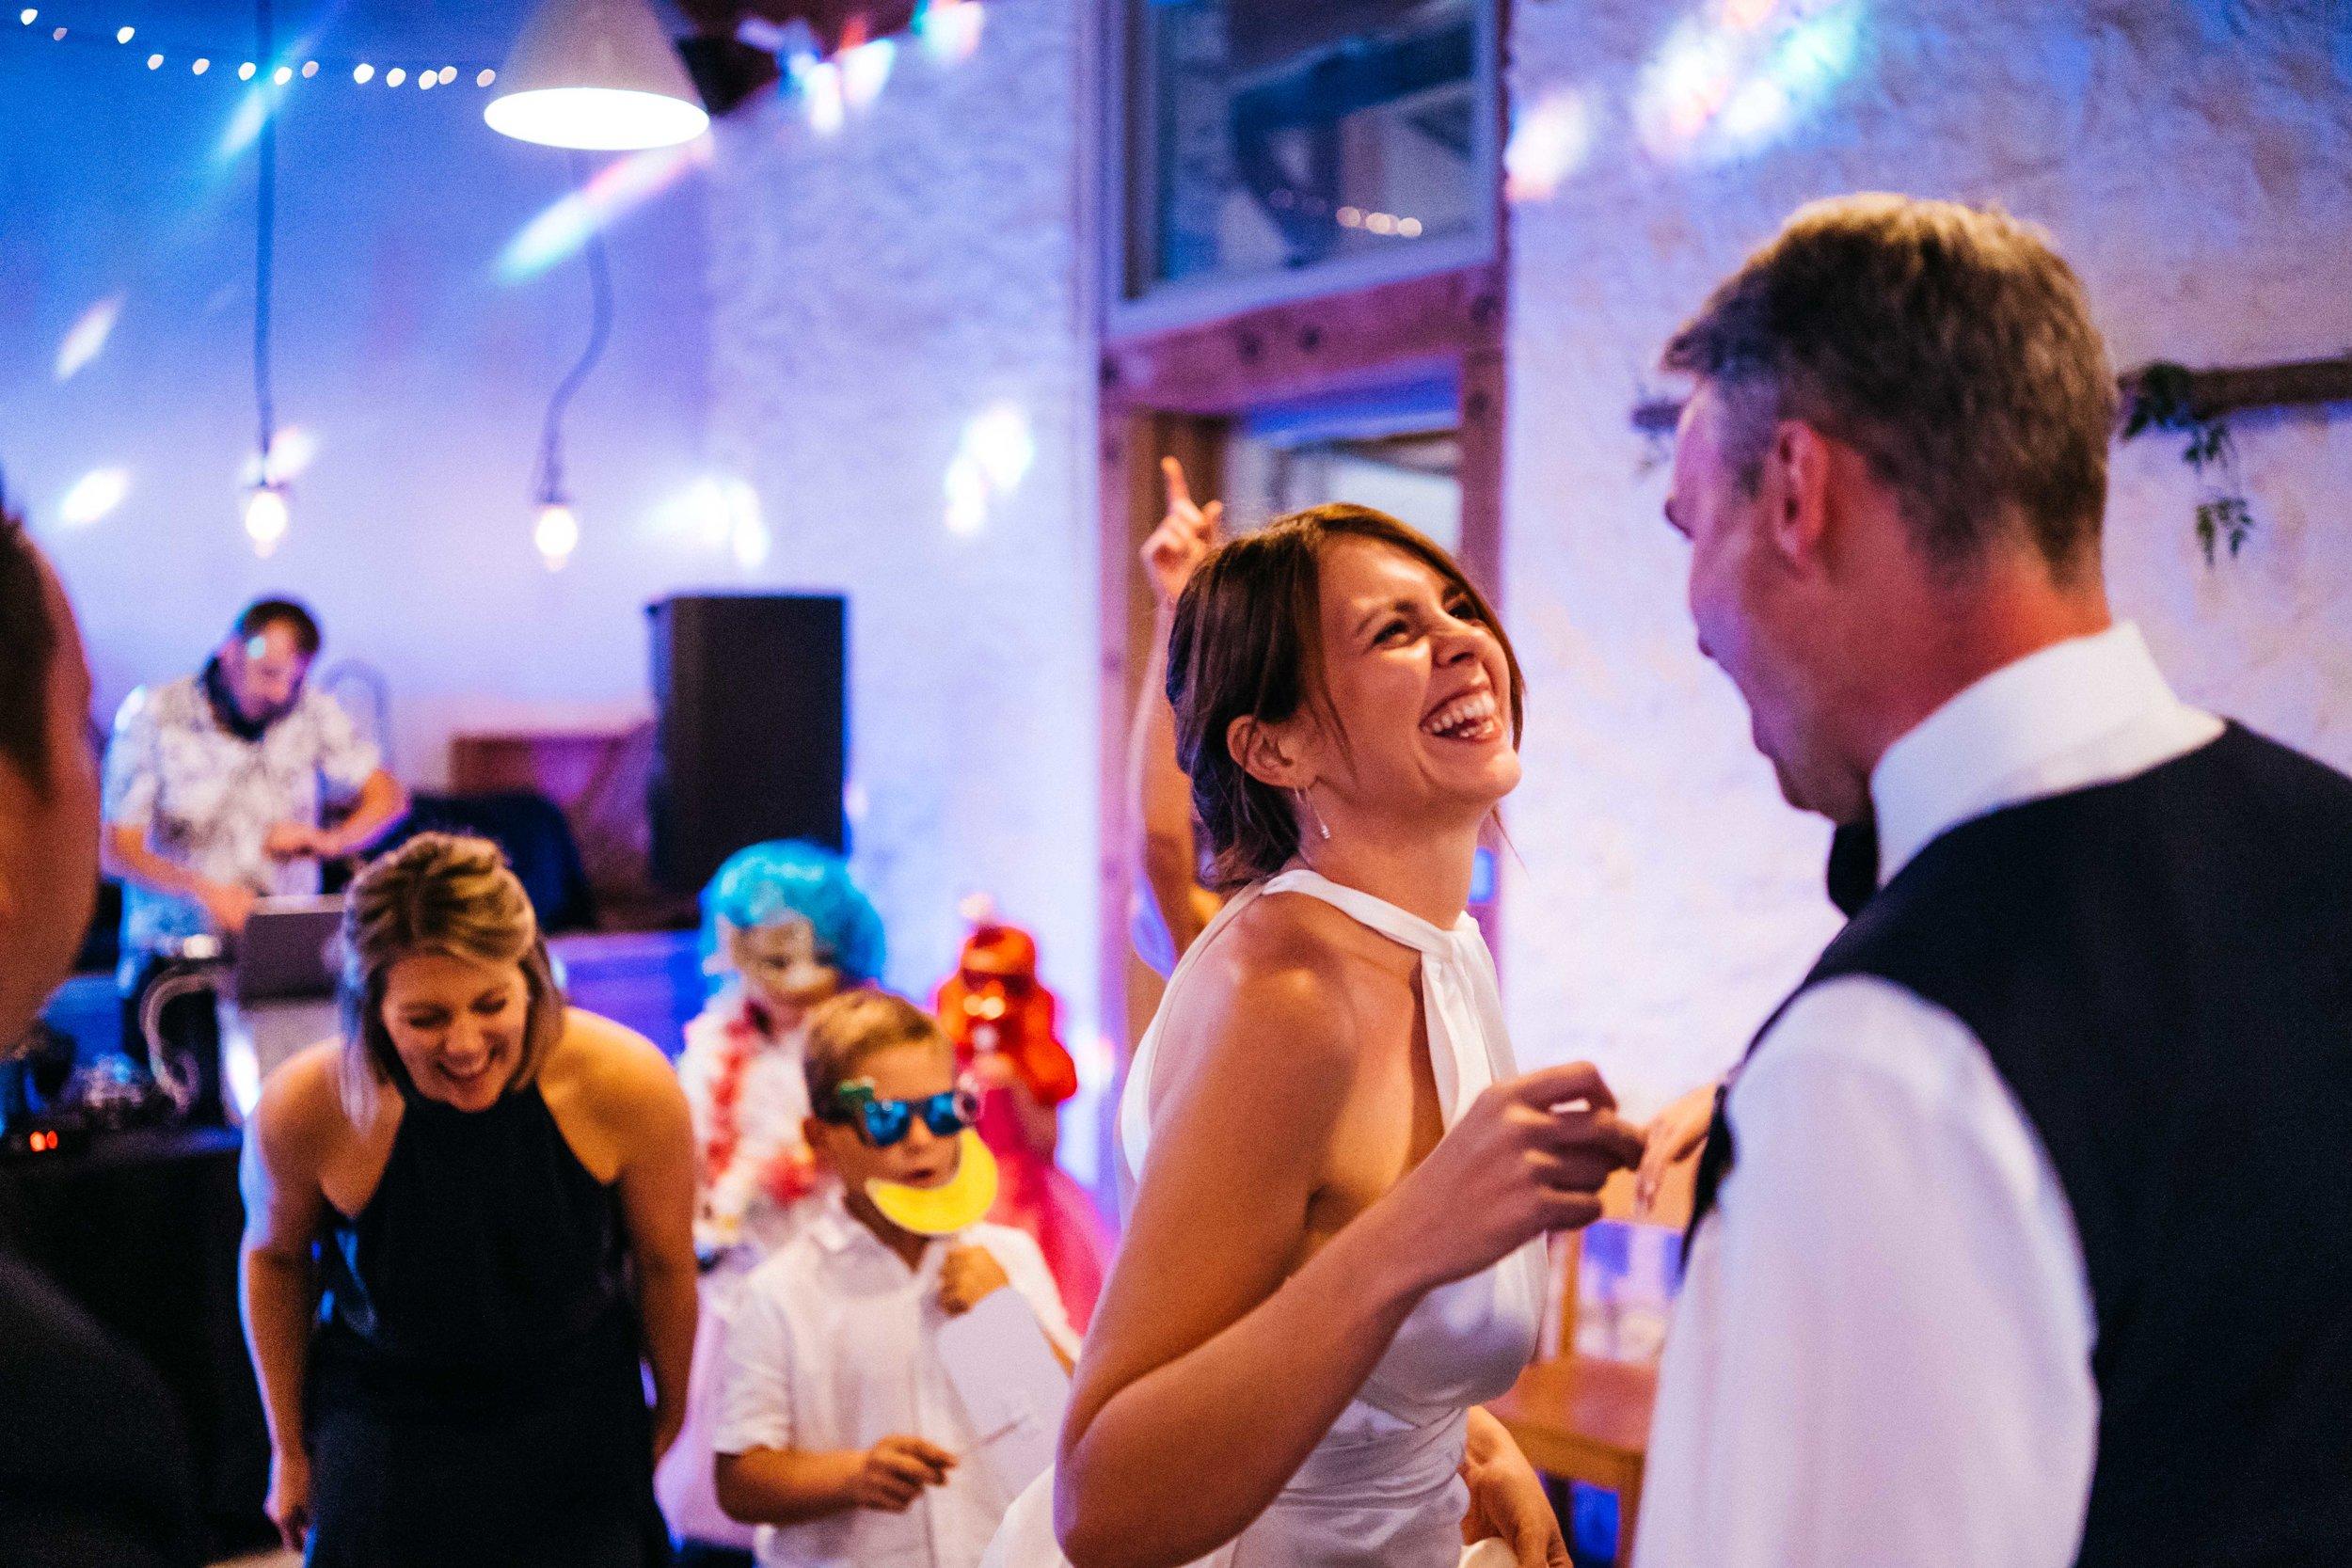 river-cottage-wedding-02369.jpg